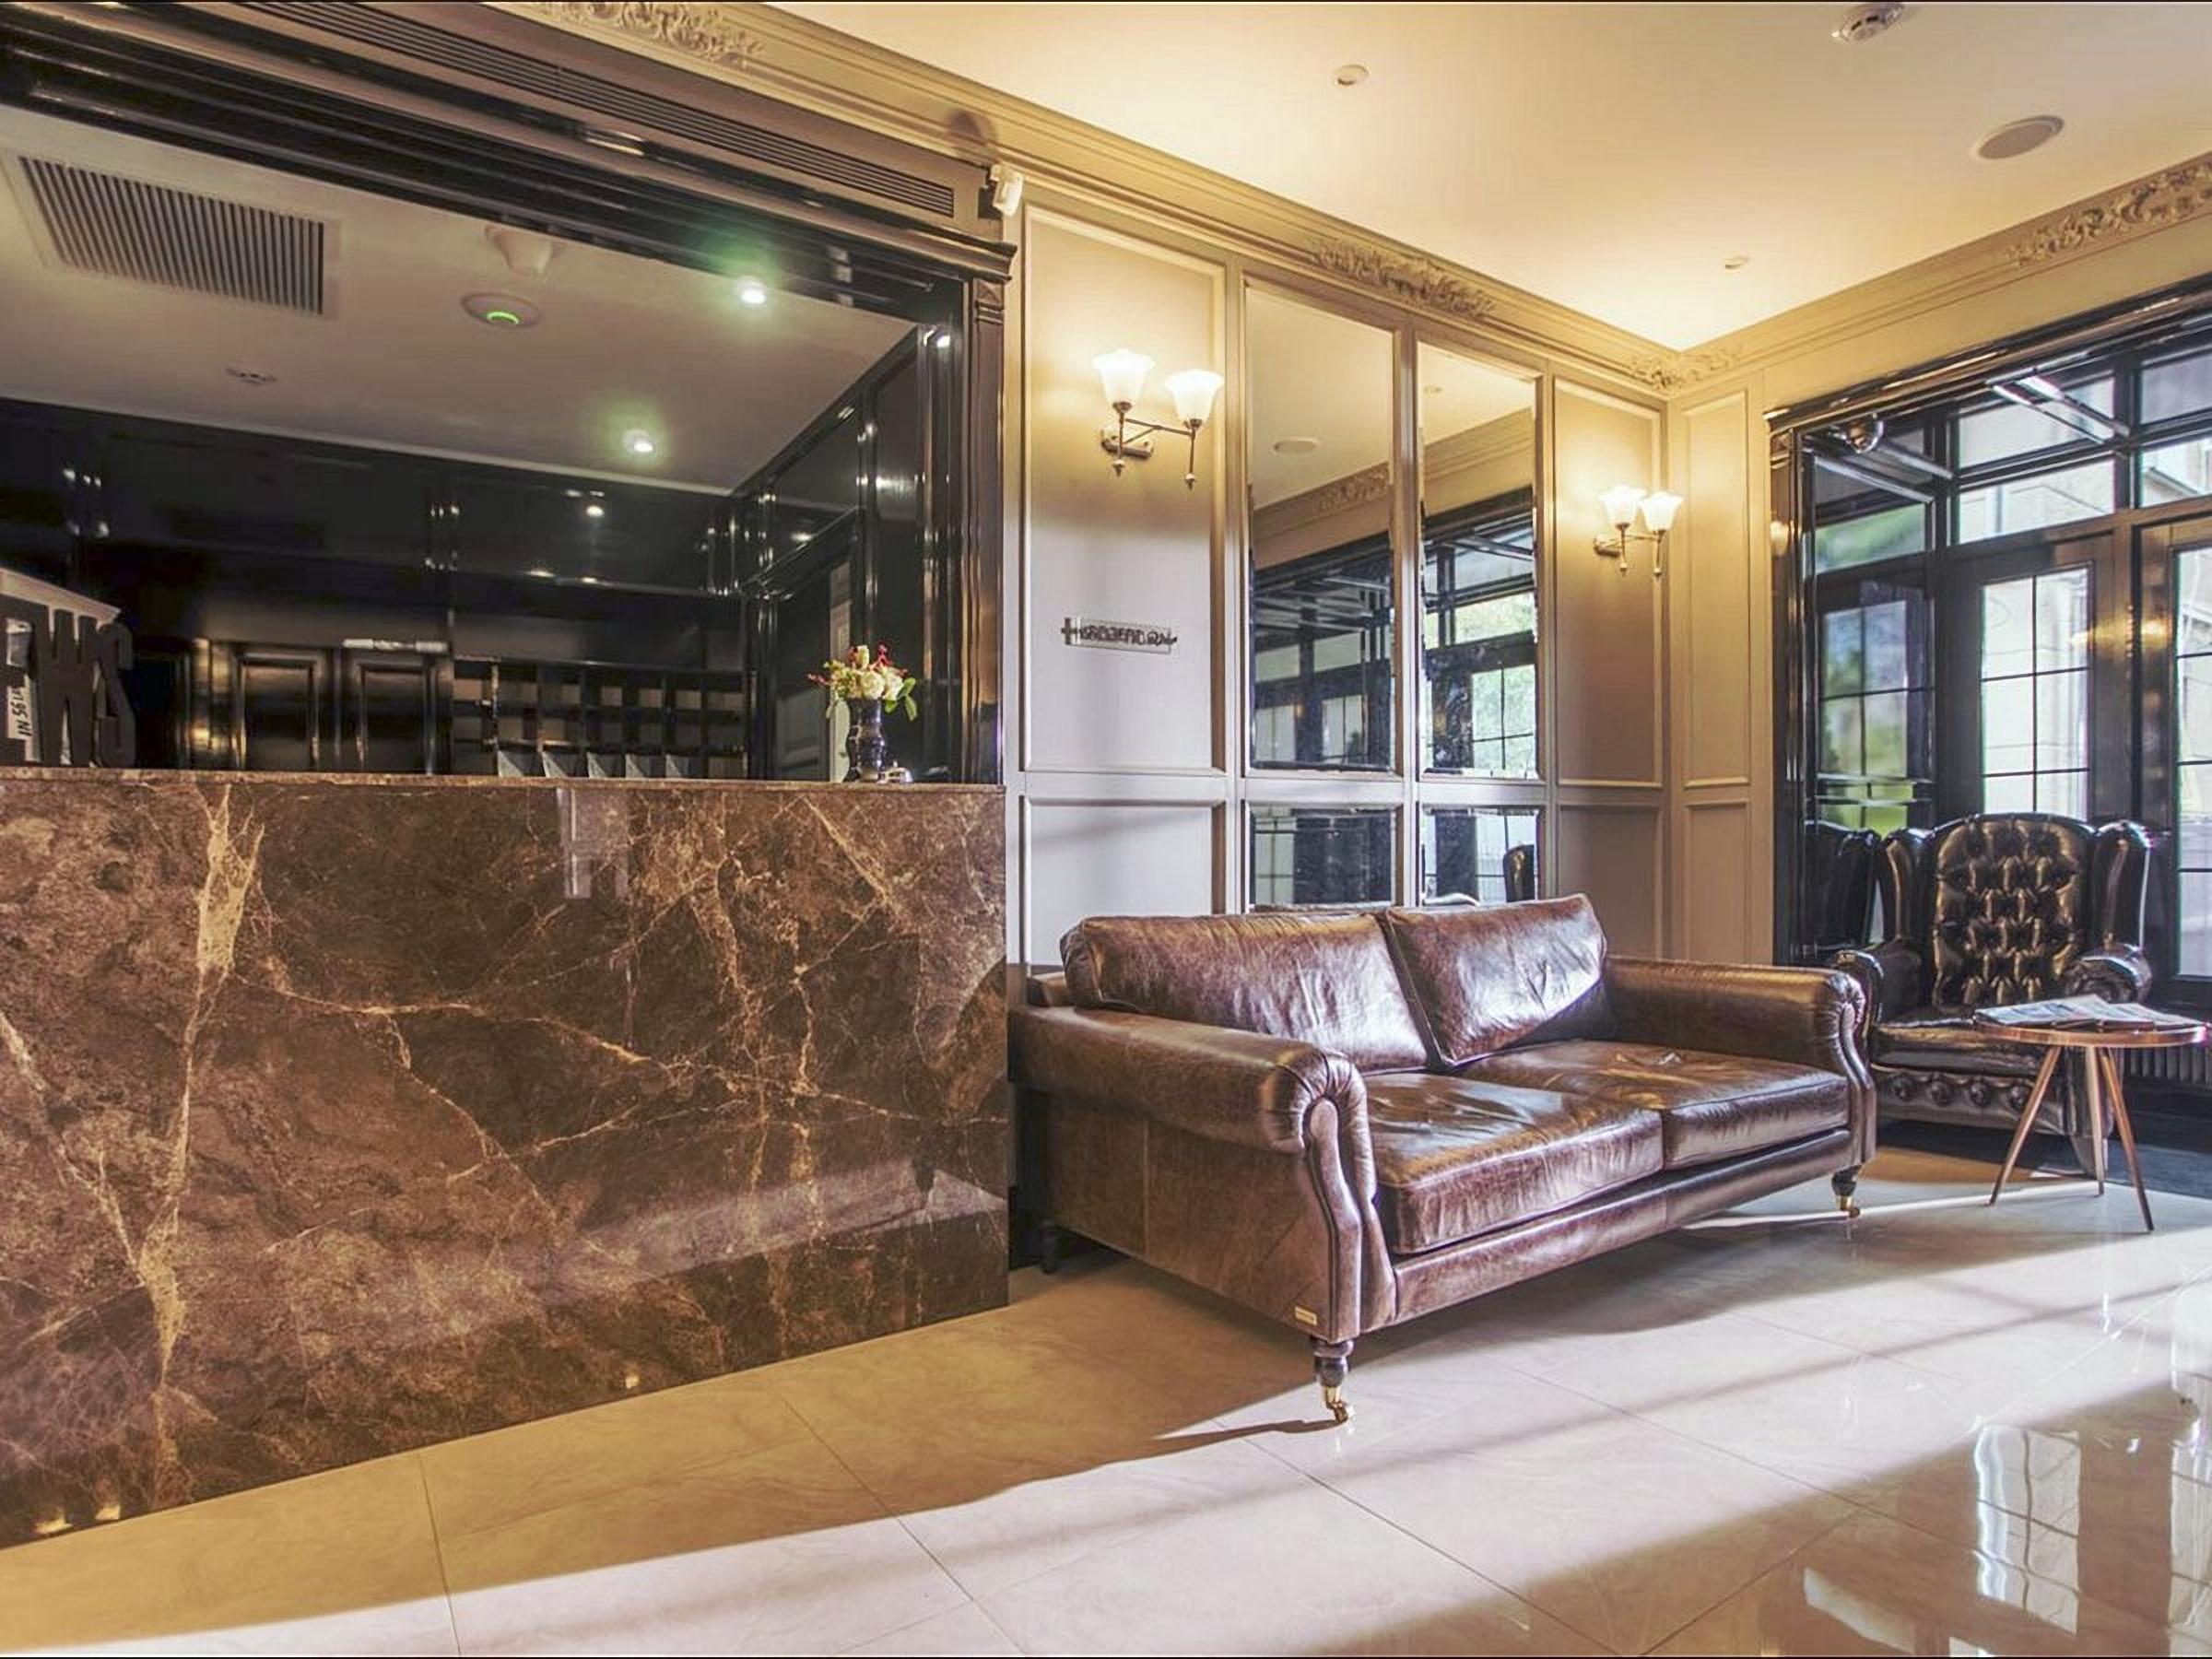 Wall Street Hotel lobby Odessa Ukraine